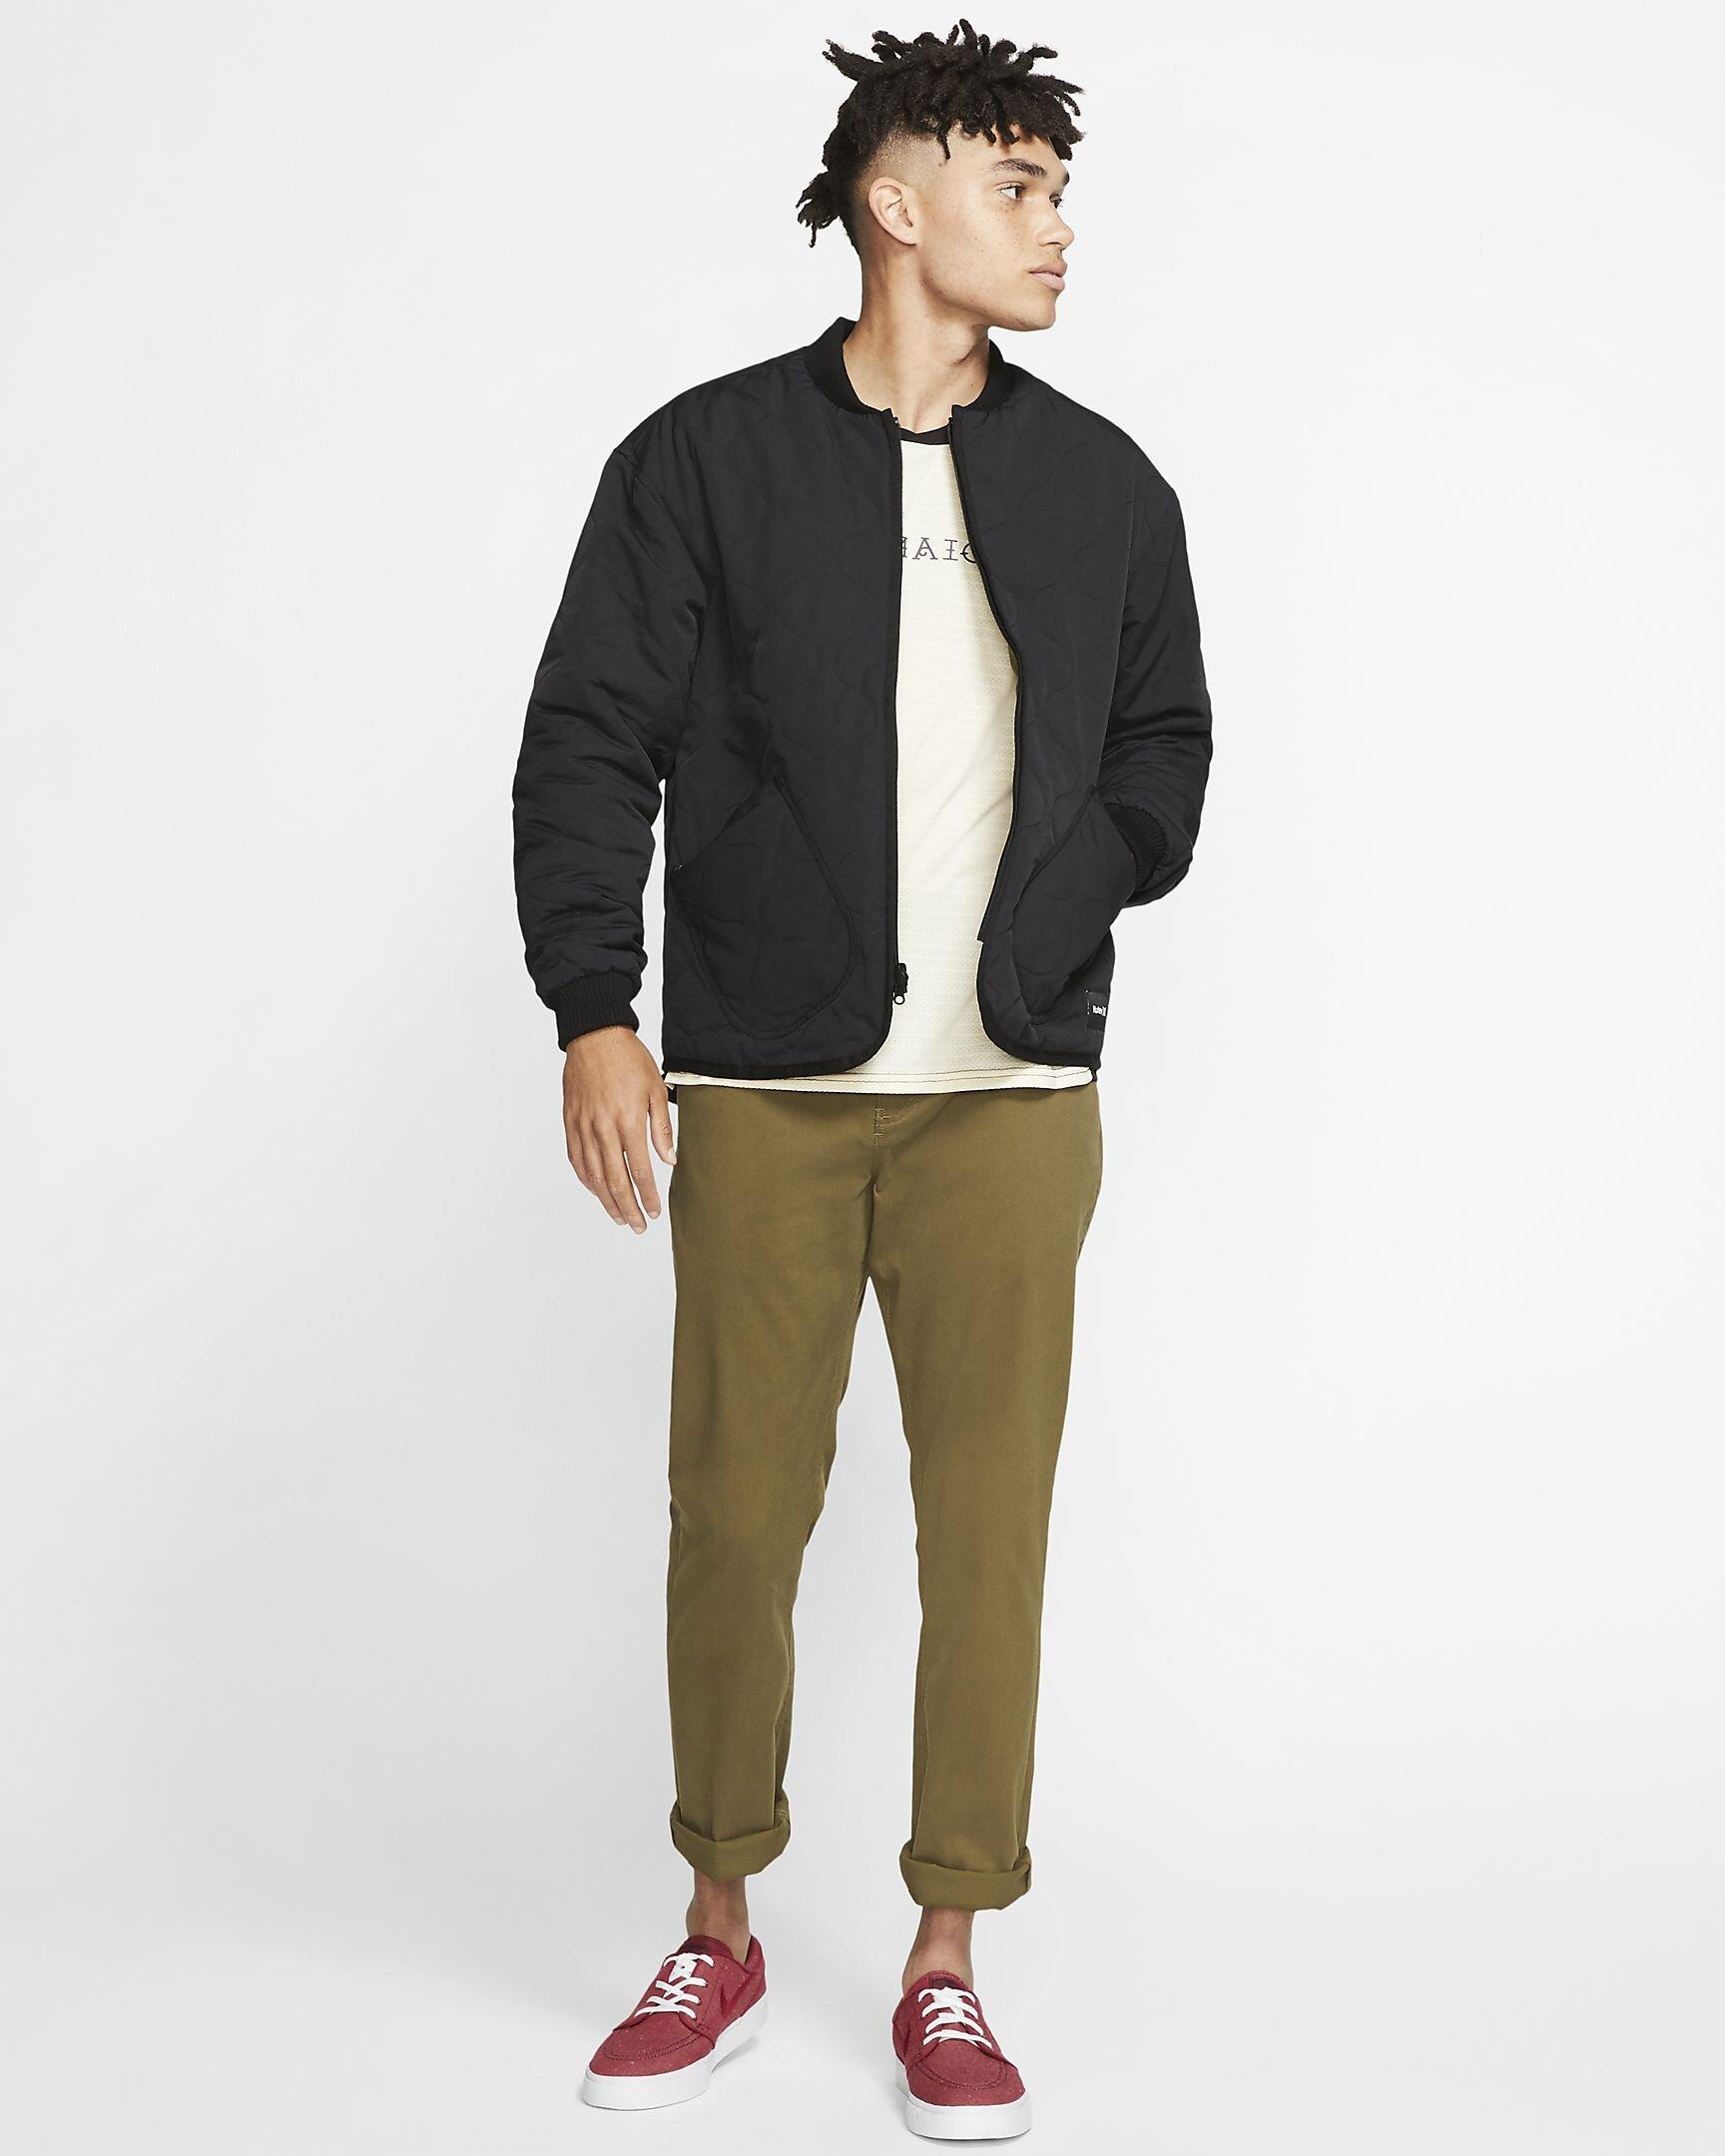 hurley-jamaica-mens-jacket-w4c3W4-2.jpg